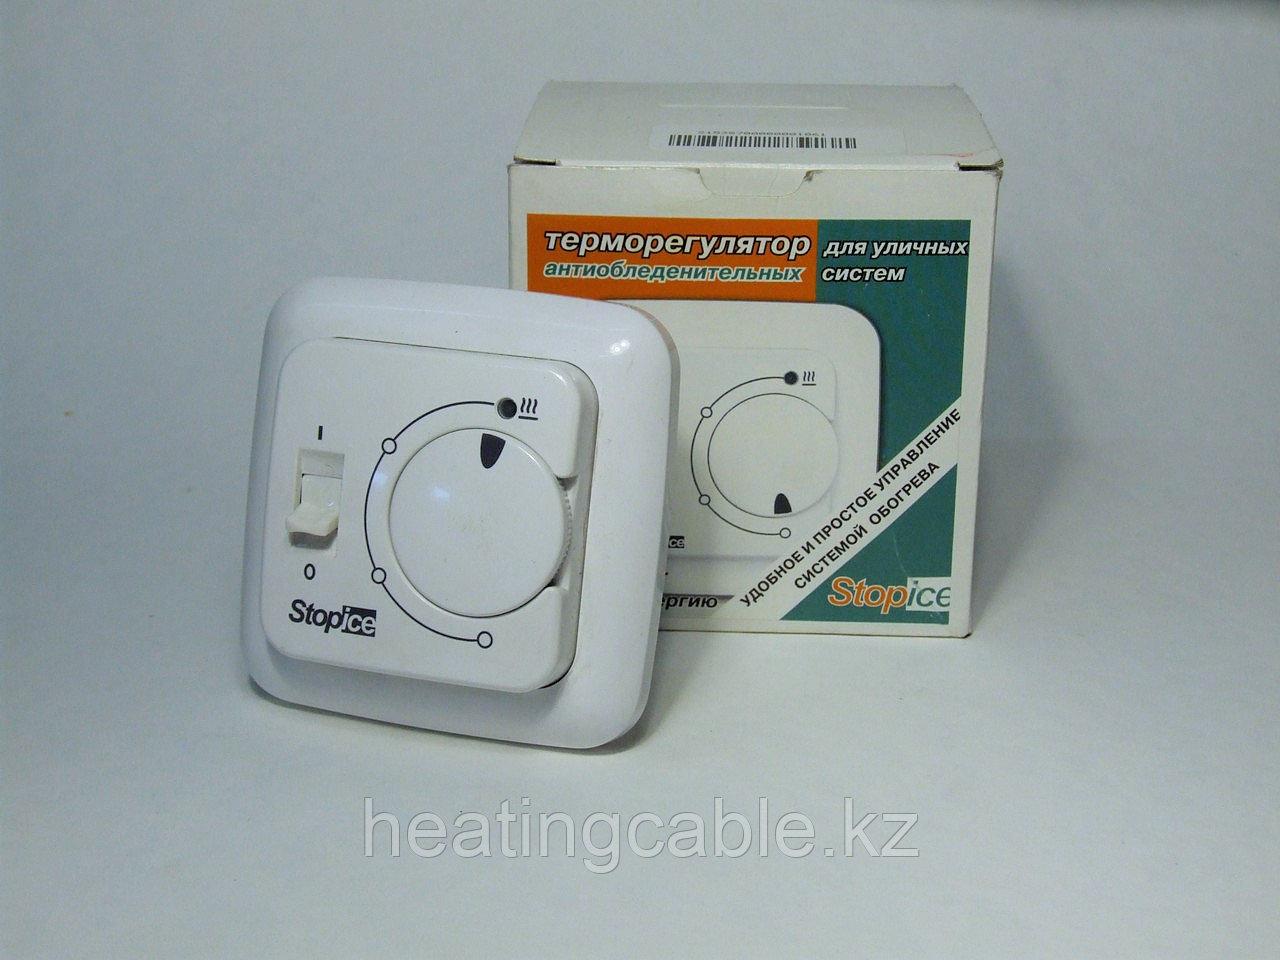 Терморегулятор TP-140 STOPice